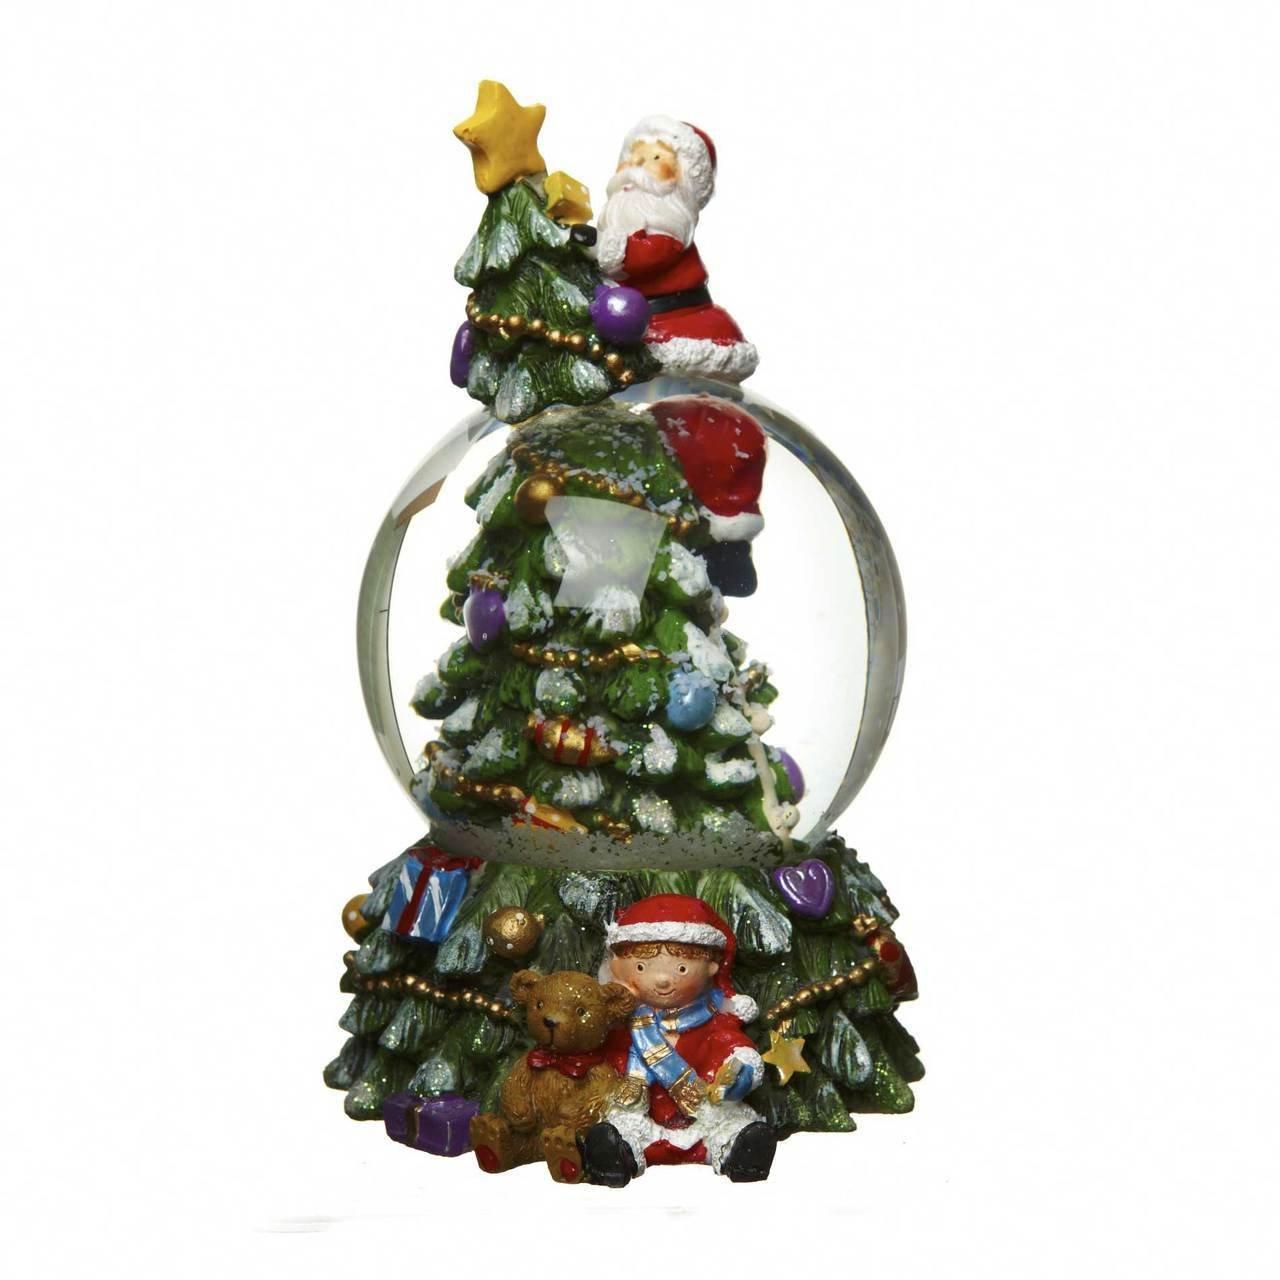 Christmas Tree Water Globe Ornament by Heaven Sends, 21.0000